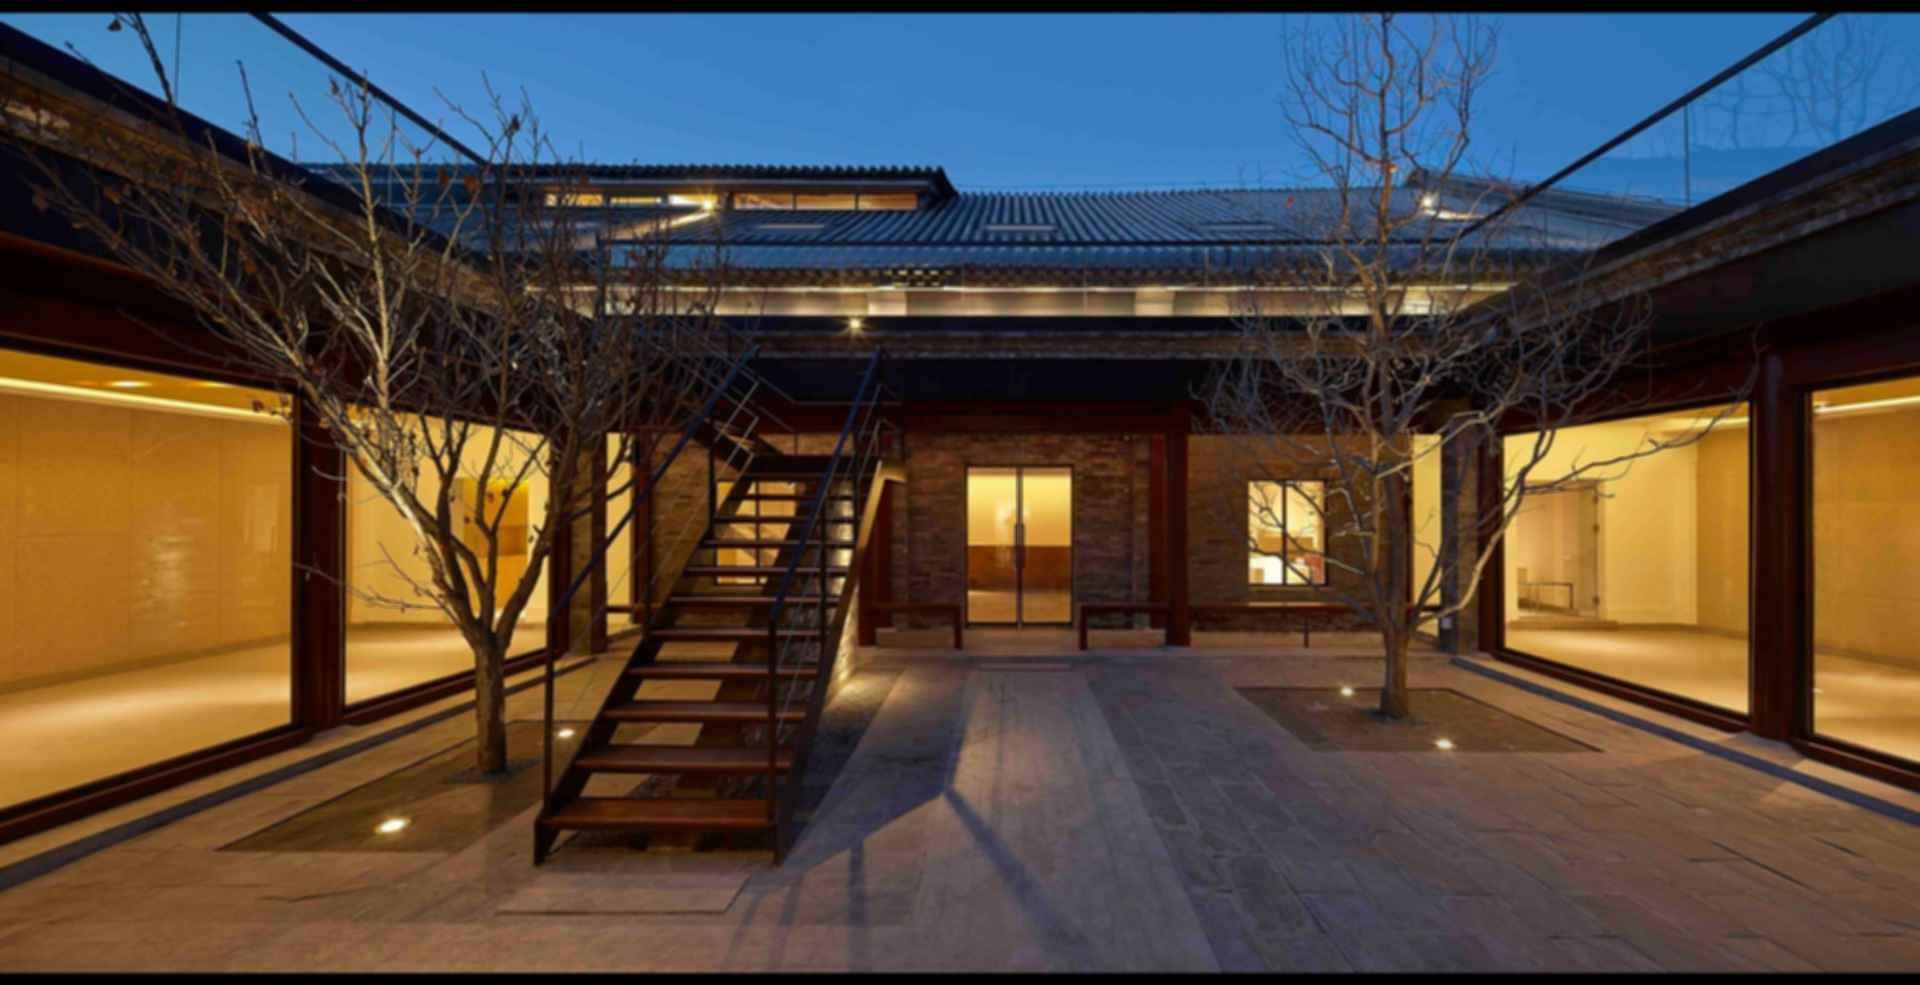 Arrow Factory: Hutong Media & Culture Creative Space - entrance